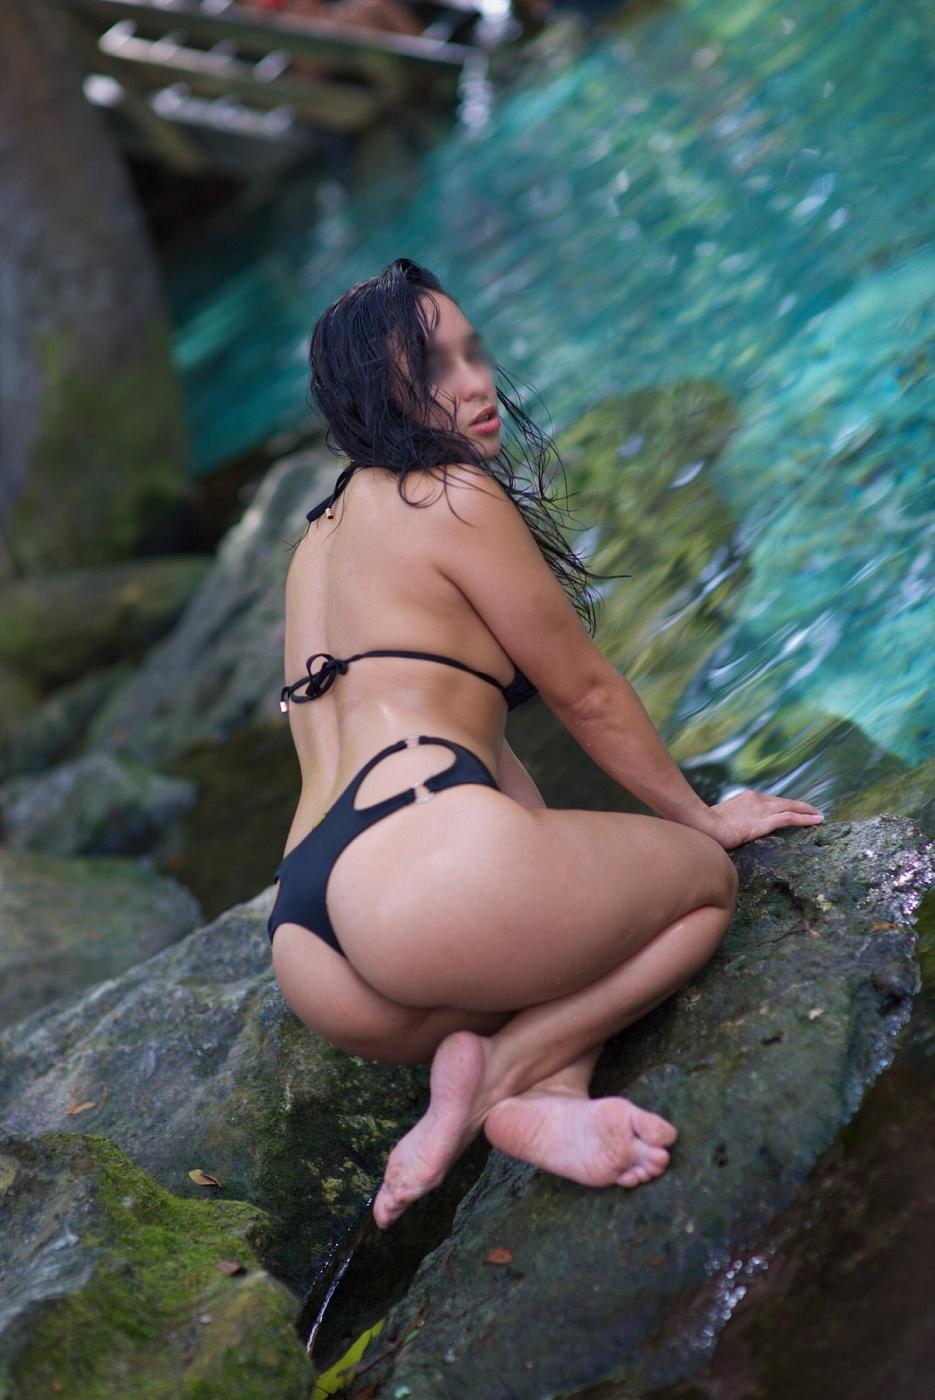 Sofia Nova Porn Star